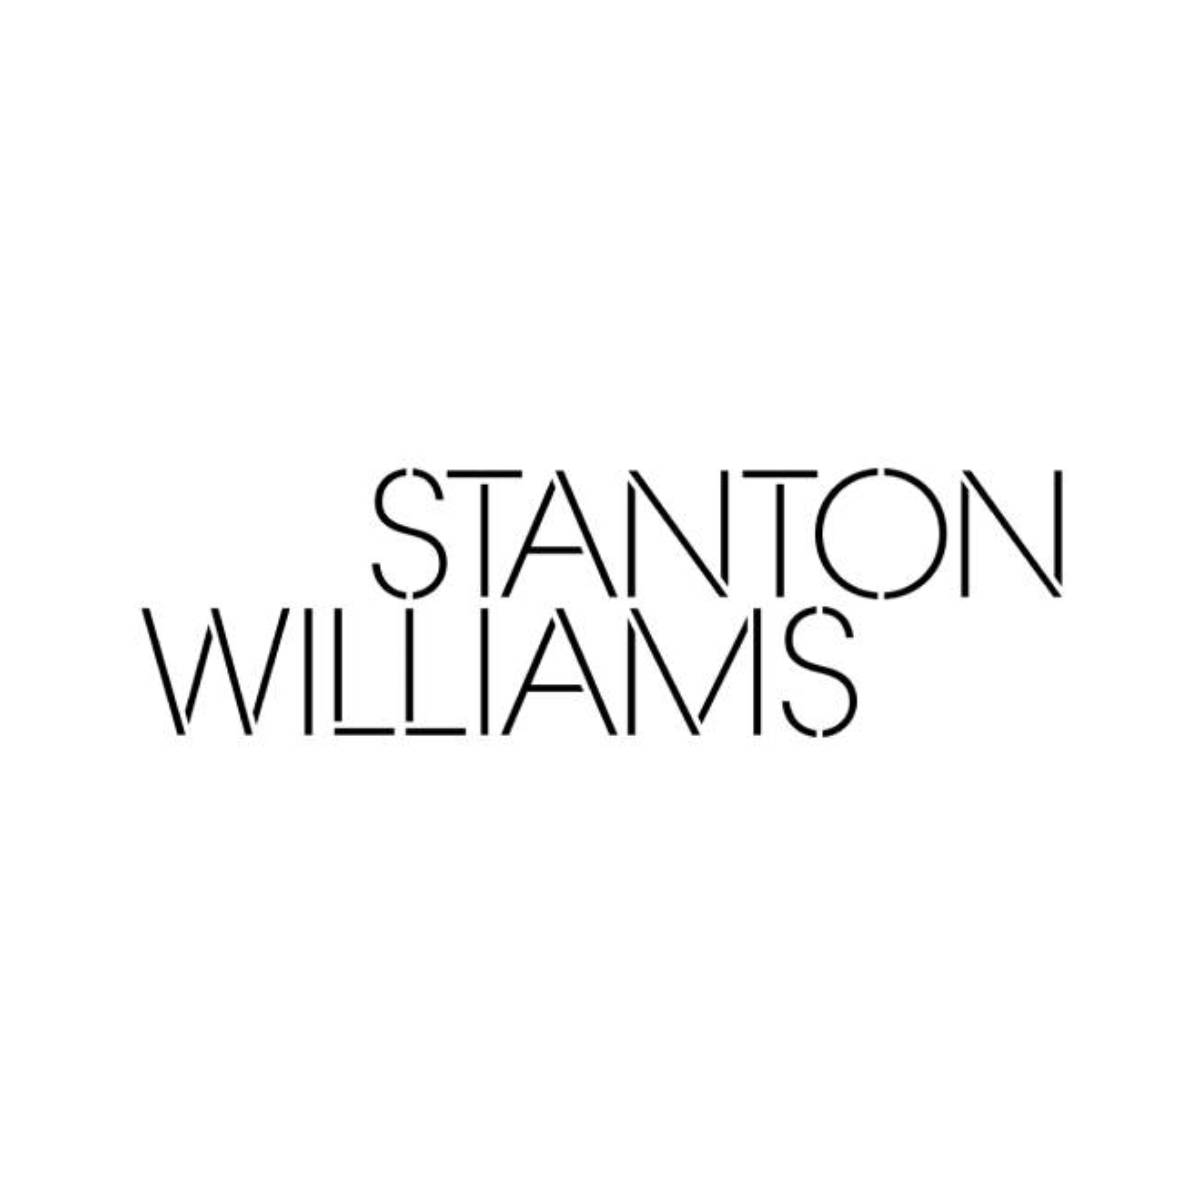 Stanton Williams.jpg